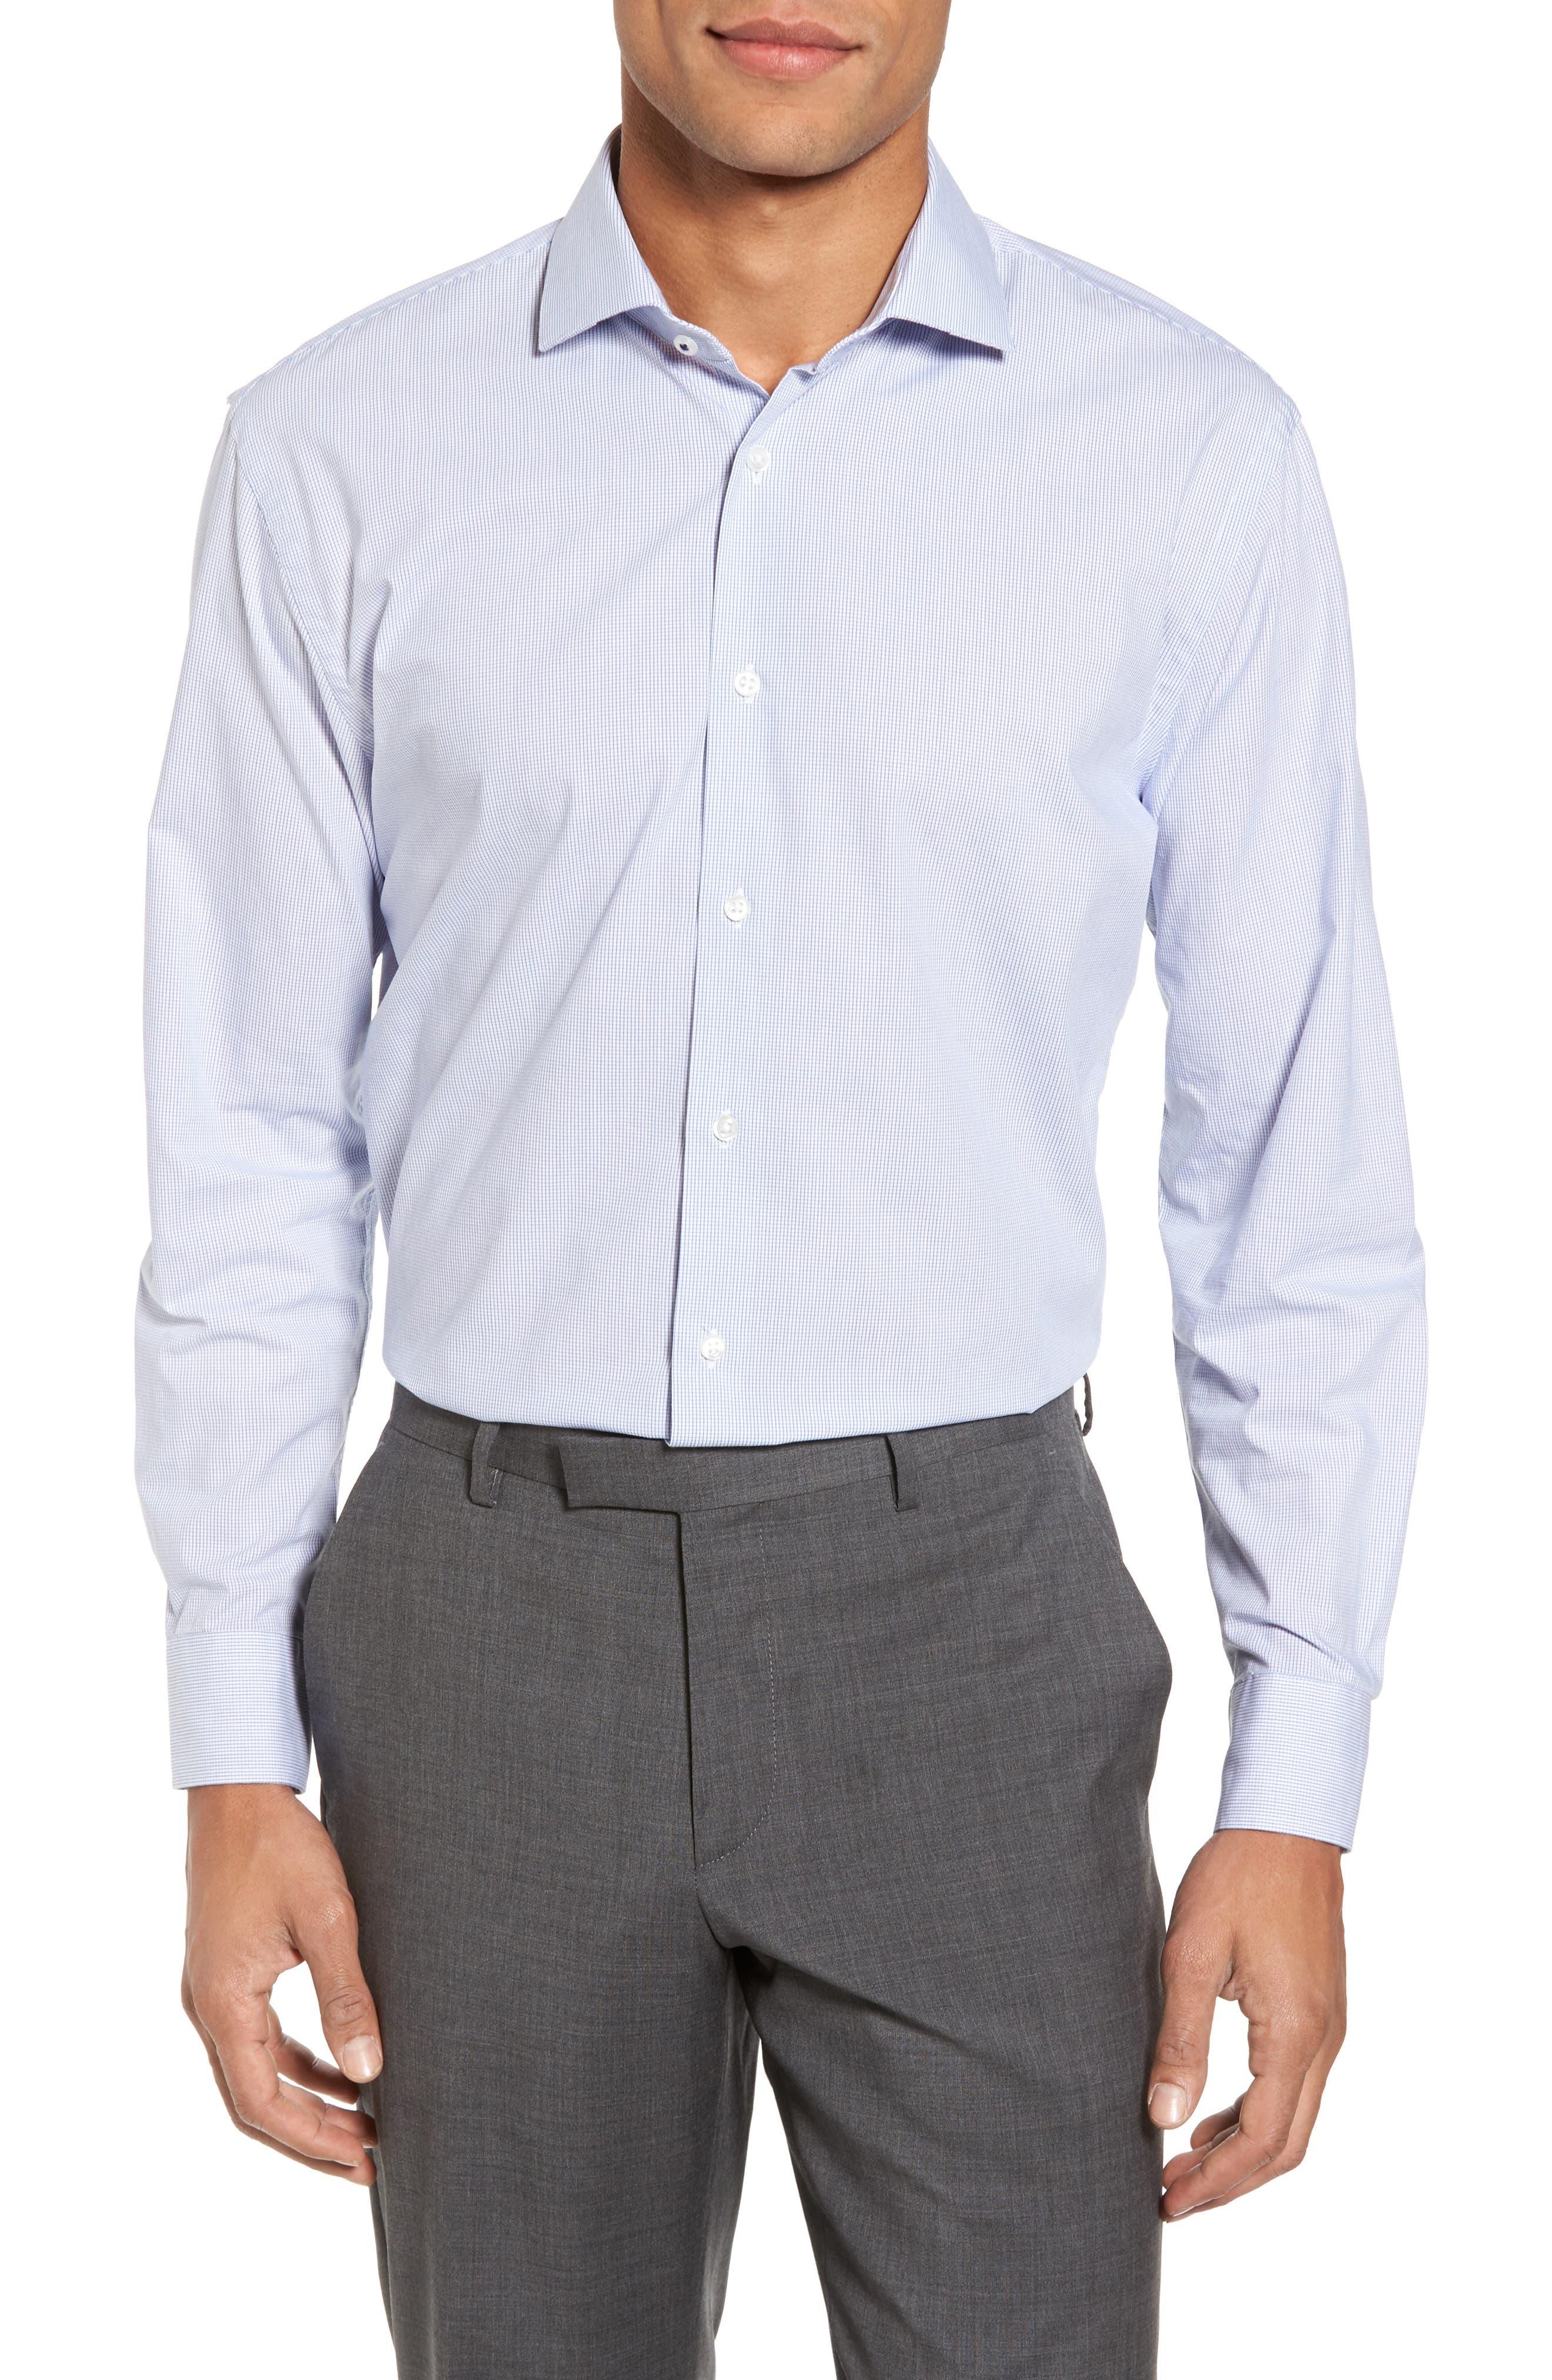 Tech-Smart Trim Fit Stretch Tattersall Dress Shirt,                             Main thumbnail 1, color,                             401